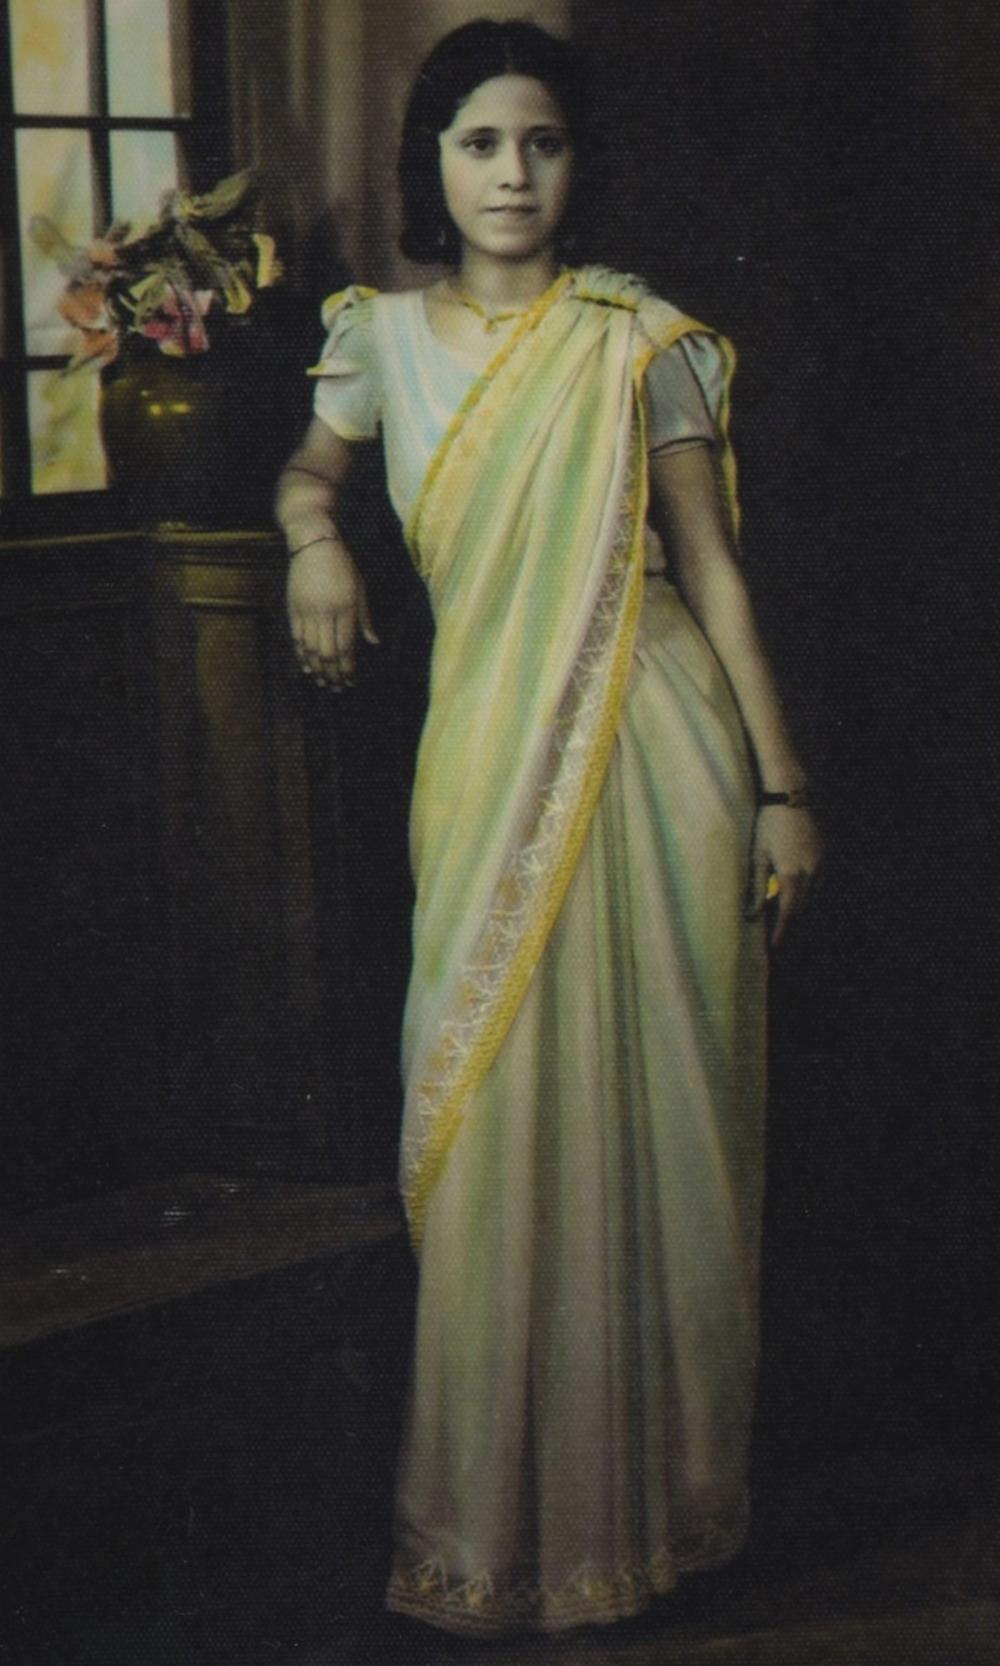 Young Jewish Woman In Bombay 1940 1948 Zvia Vintage Indian Clothing Jewish Women Historical Fashion Fashion